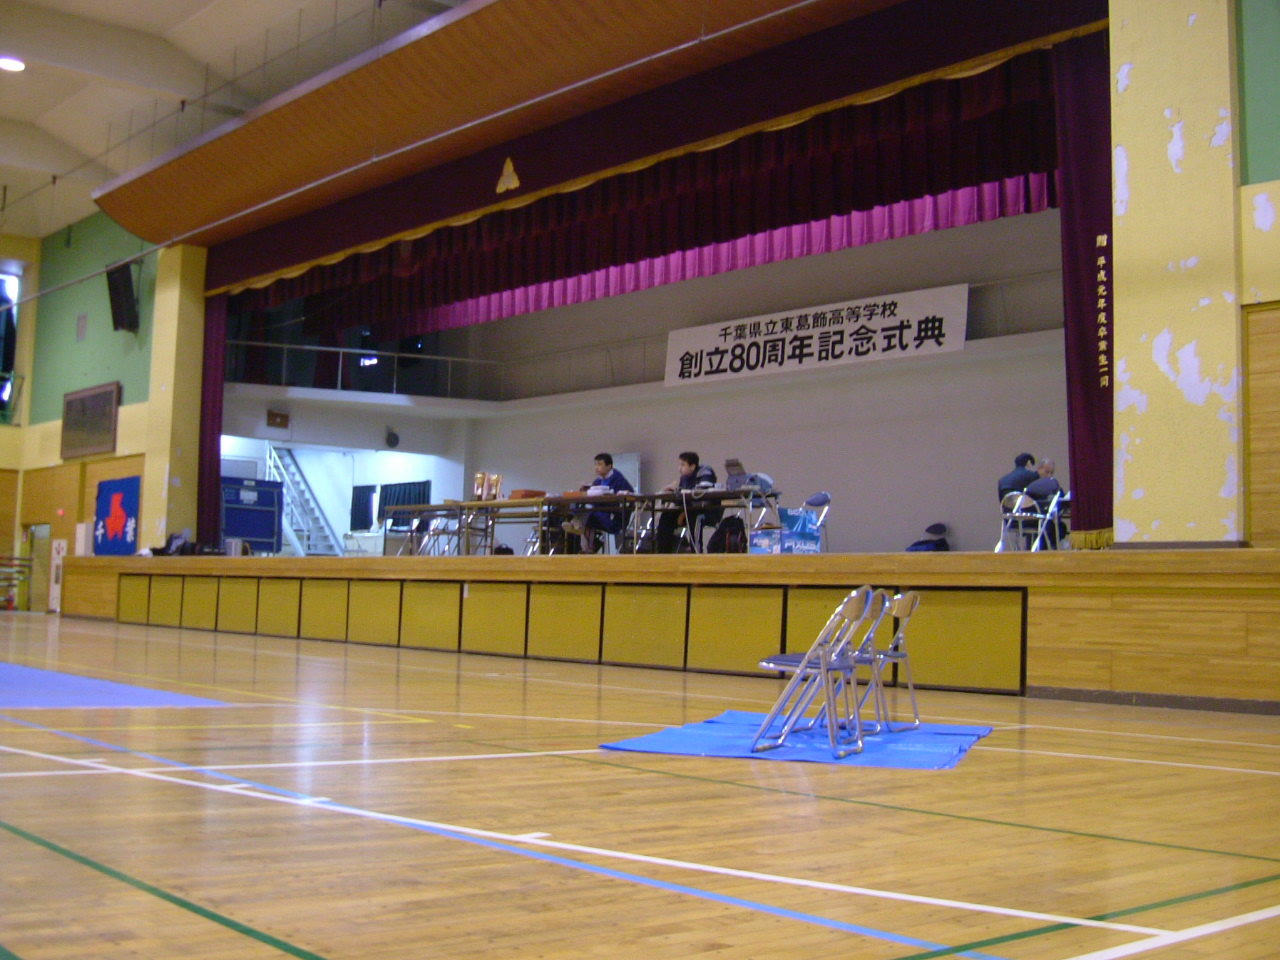 葛飾 高校 東 葛飾総合高校(東京都)の情報(偏差値・口コミなど)